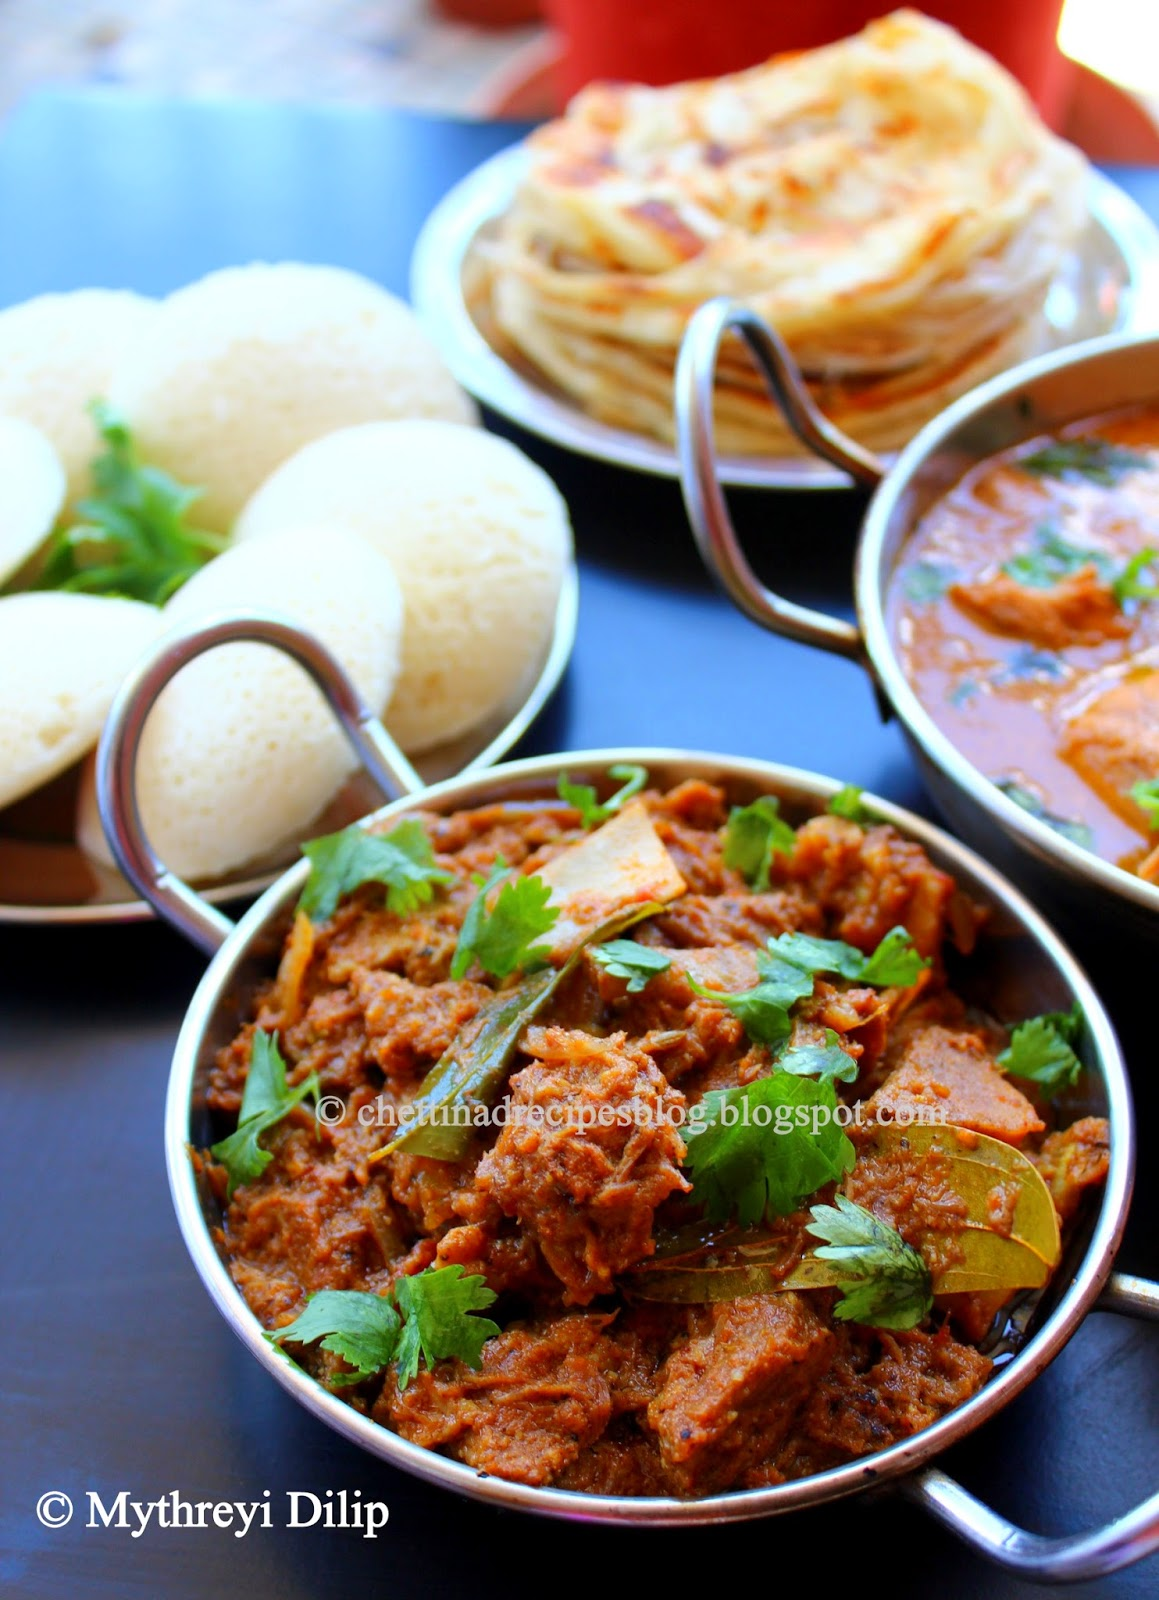 chettinad mutton masala / attu kari masala  – pressure cooker method.